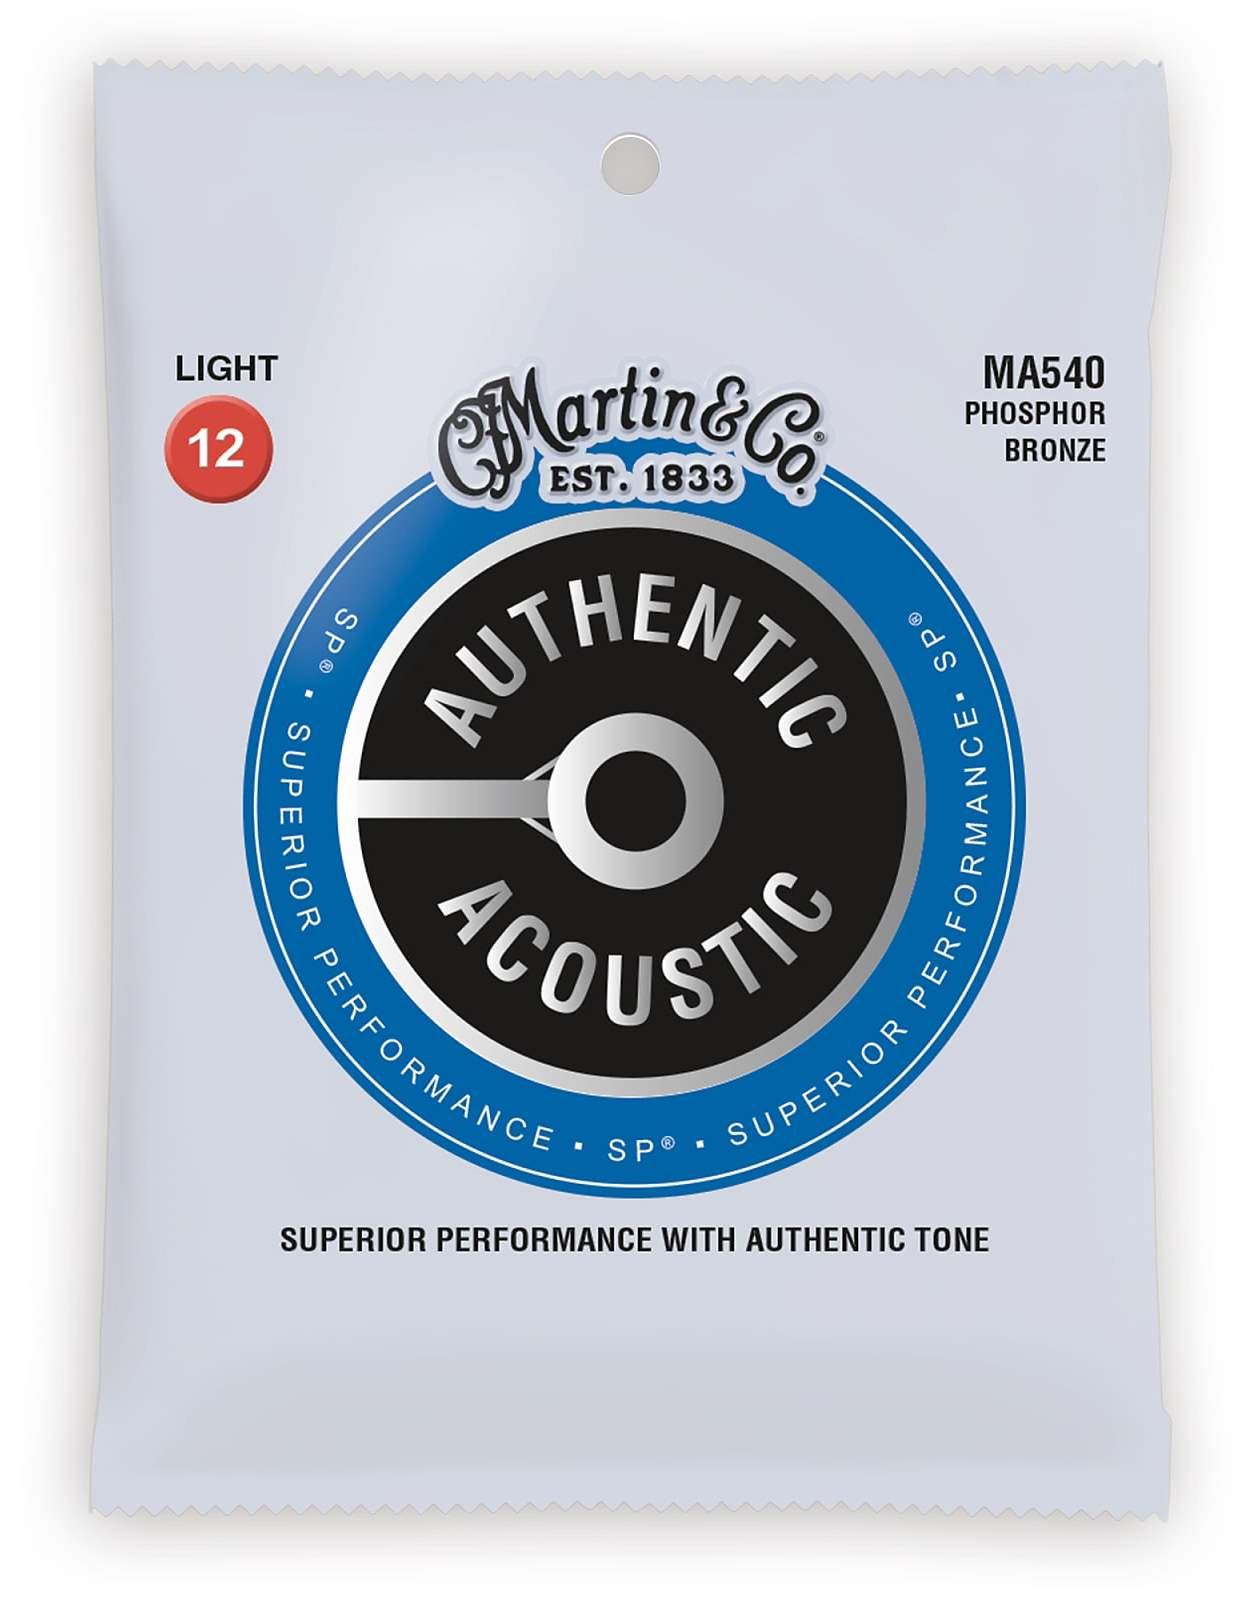 Martin Guitars MARTIN Authentic SP 92/8 Phosphor Bronze Light 12